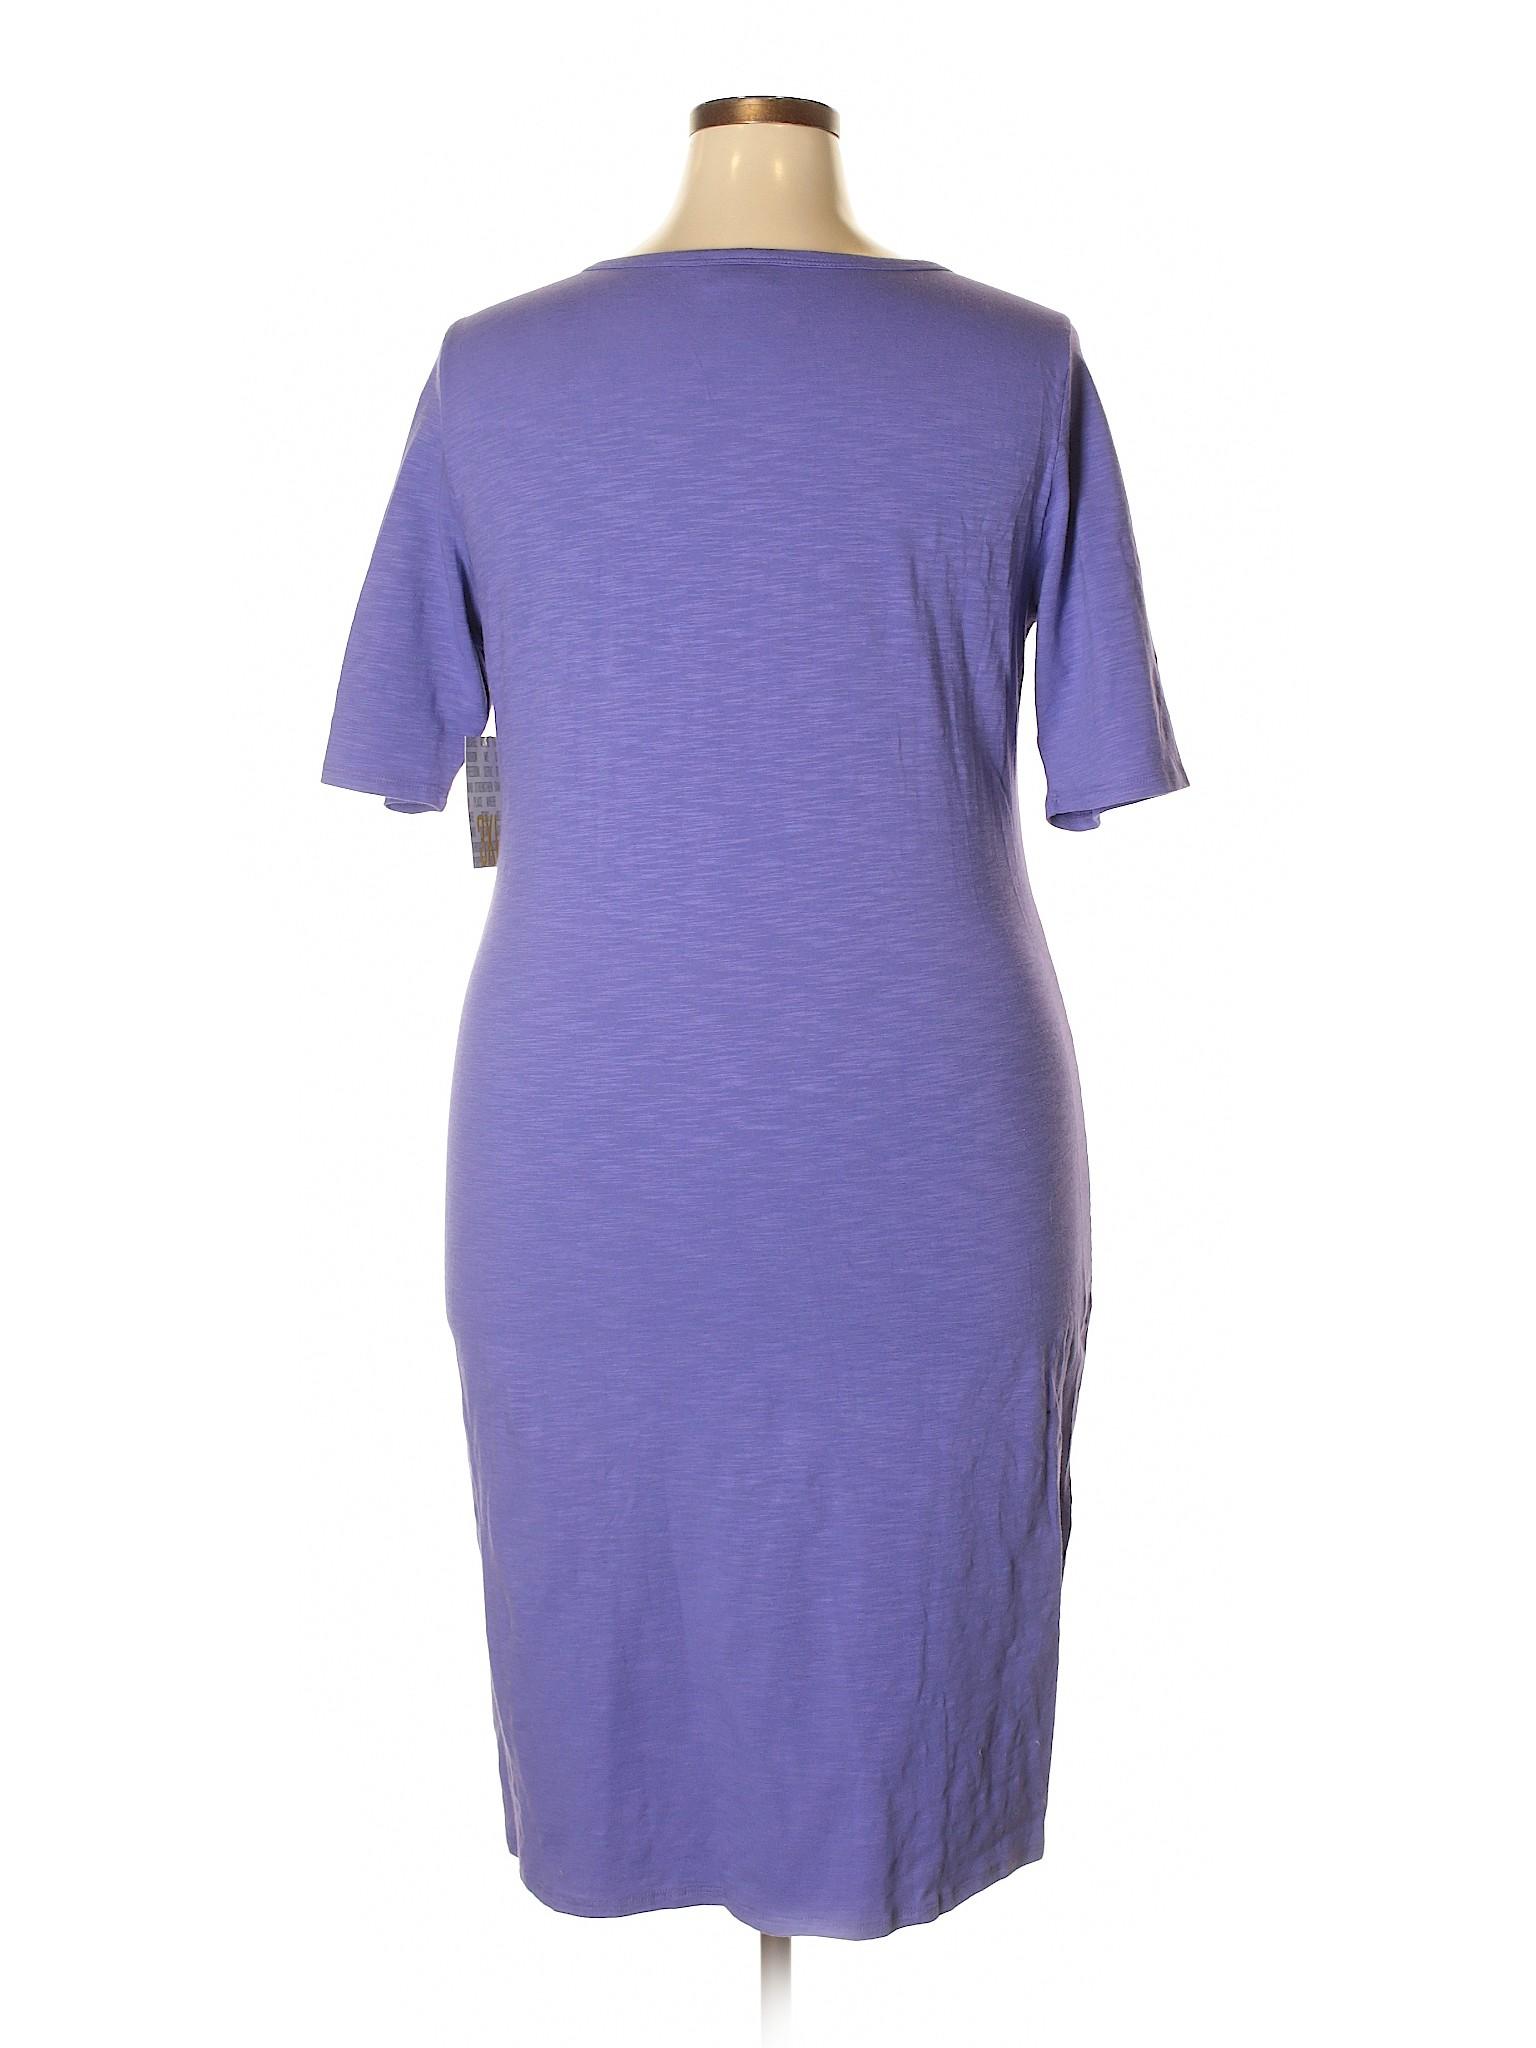 Dress Casual Lularoe Lularoe Dress Selling Casual Selling Lularoe Casual Dress Selling gRXcI5q